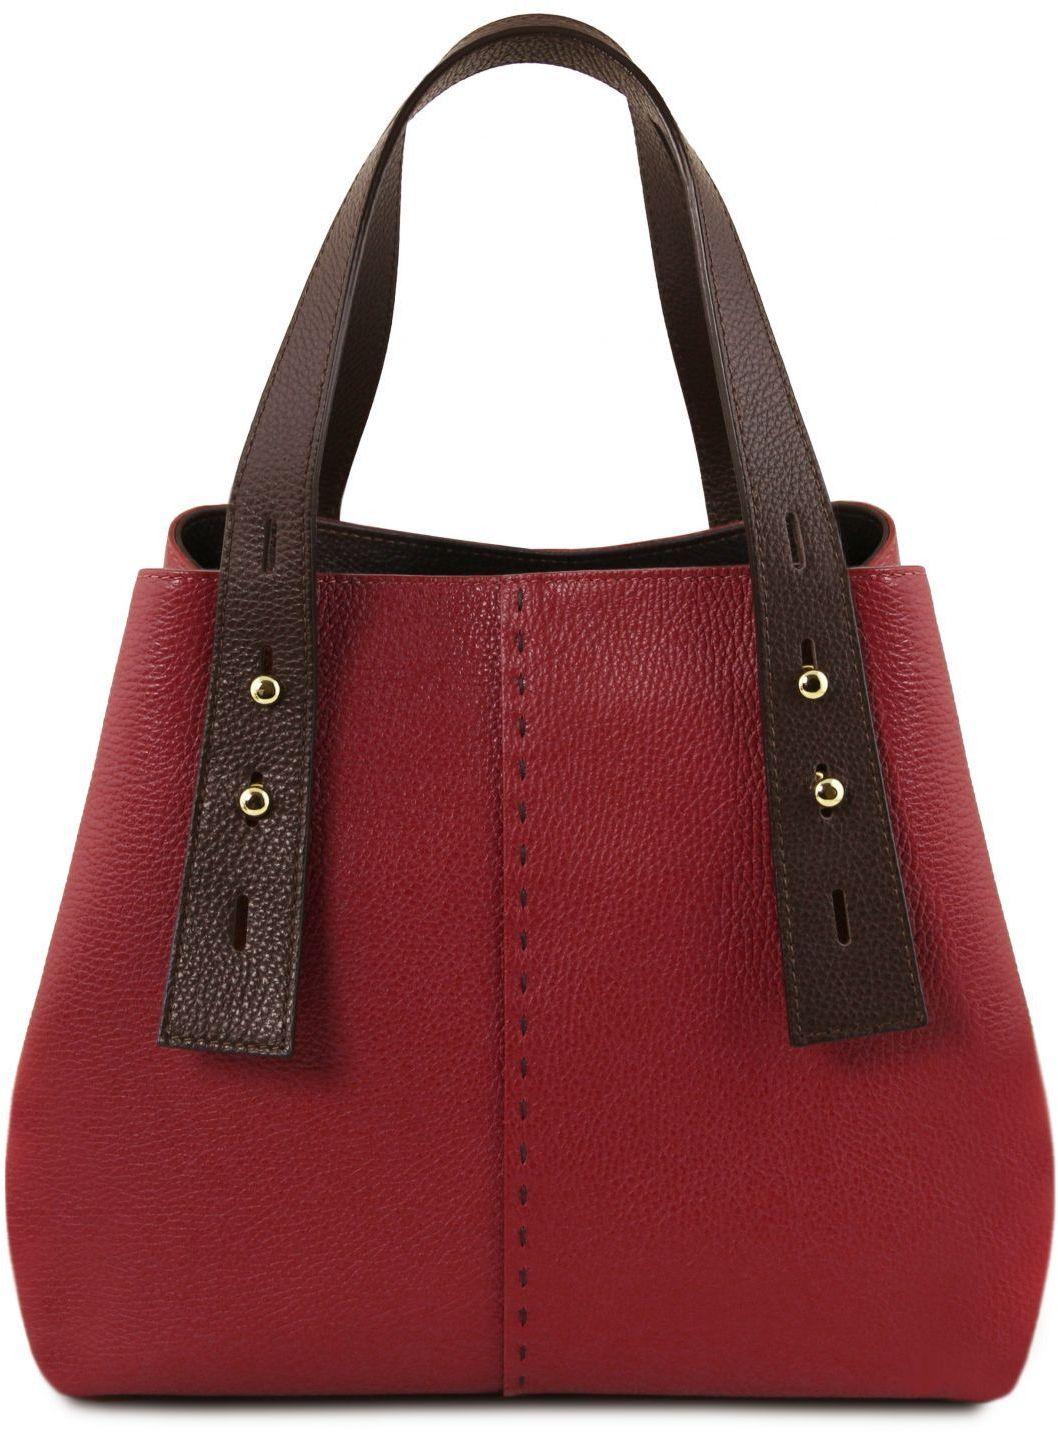 3f98cca2c3 Γυναικεία Τσάντα Δερμάτινη TL Bag TL141730 Κόκκινο Tuscany Leather ...